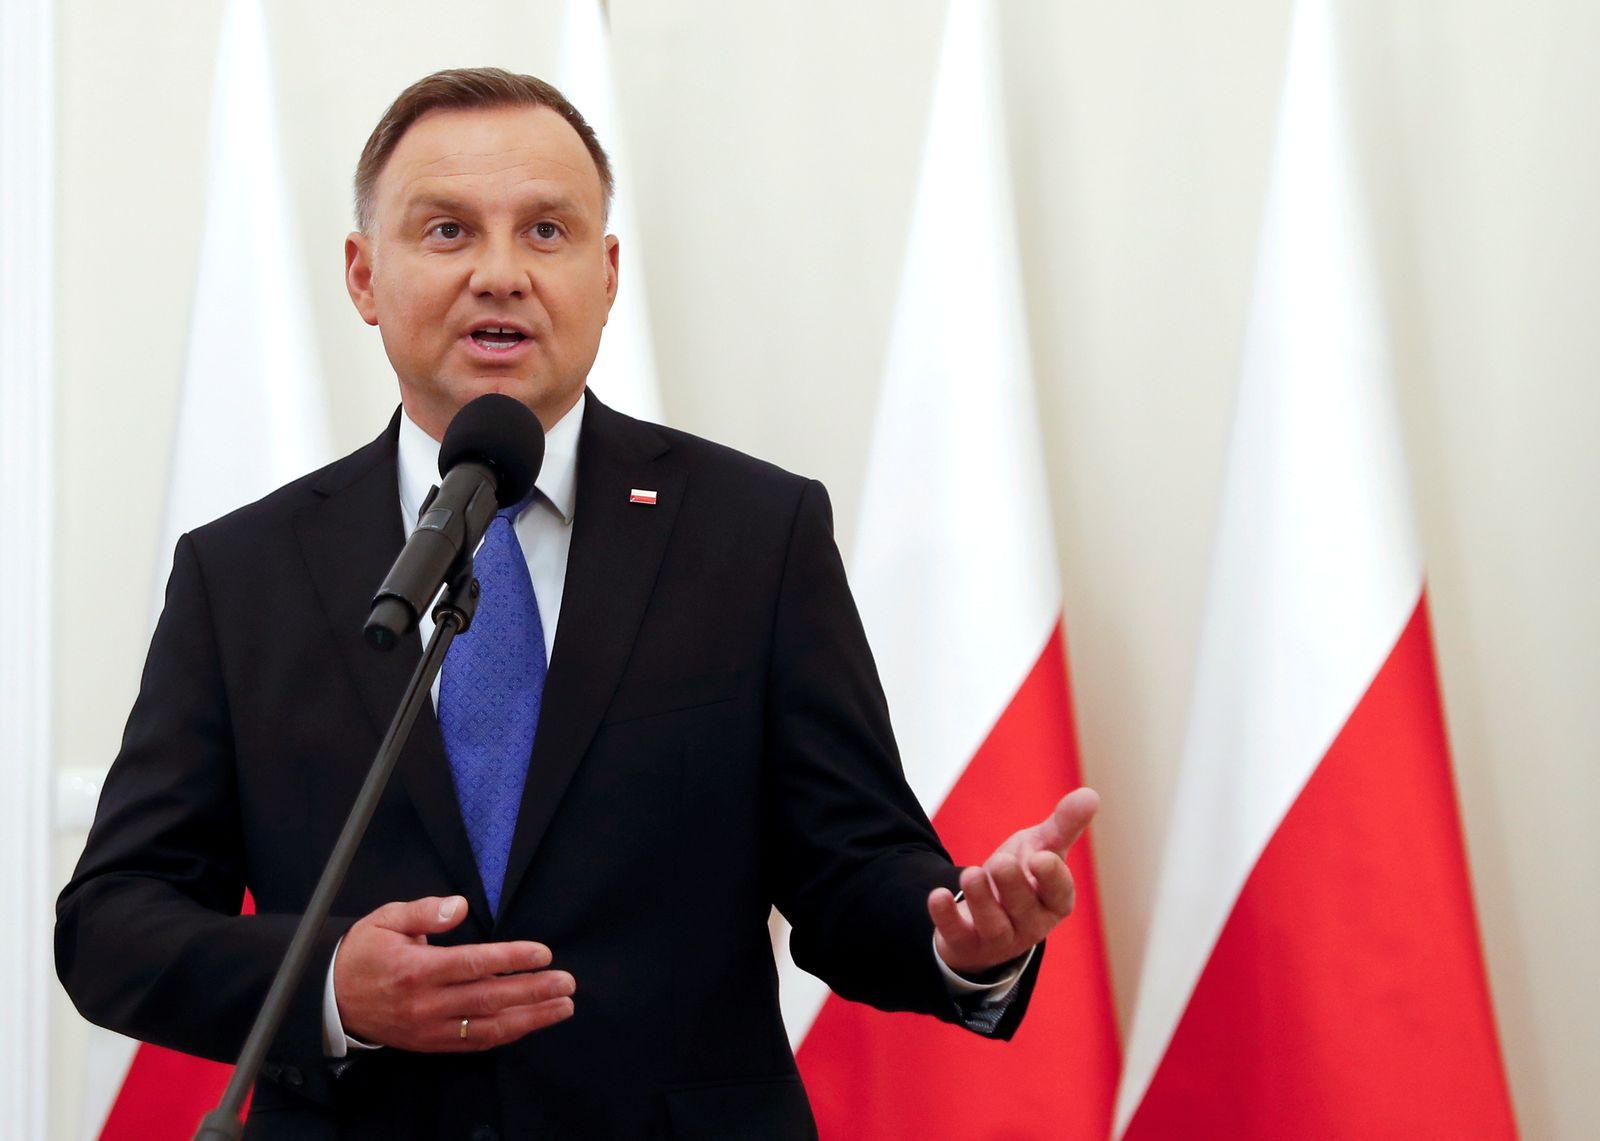 FILE PHOTO: Poland's presidential election